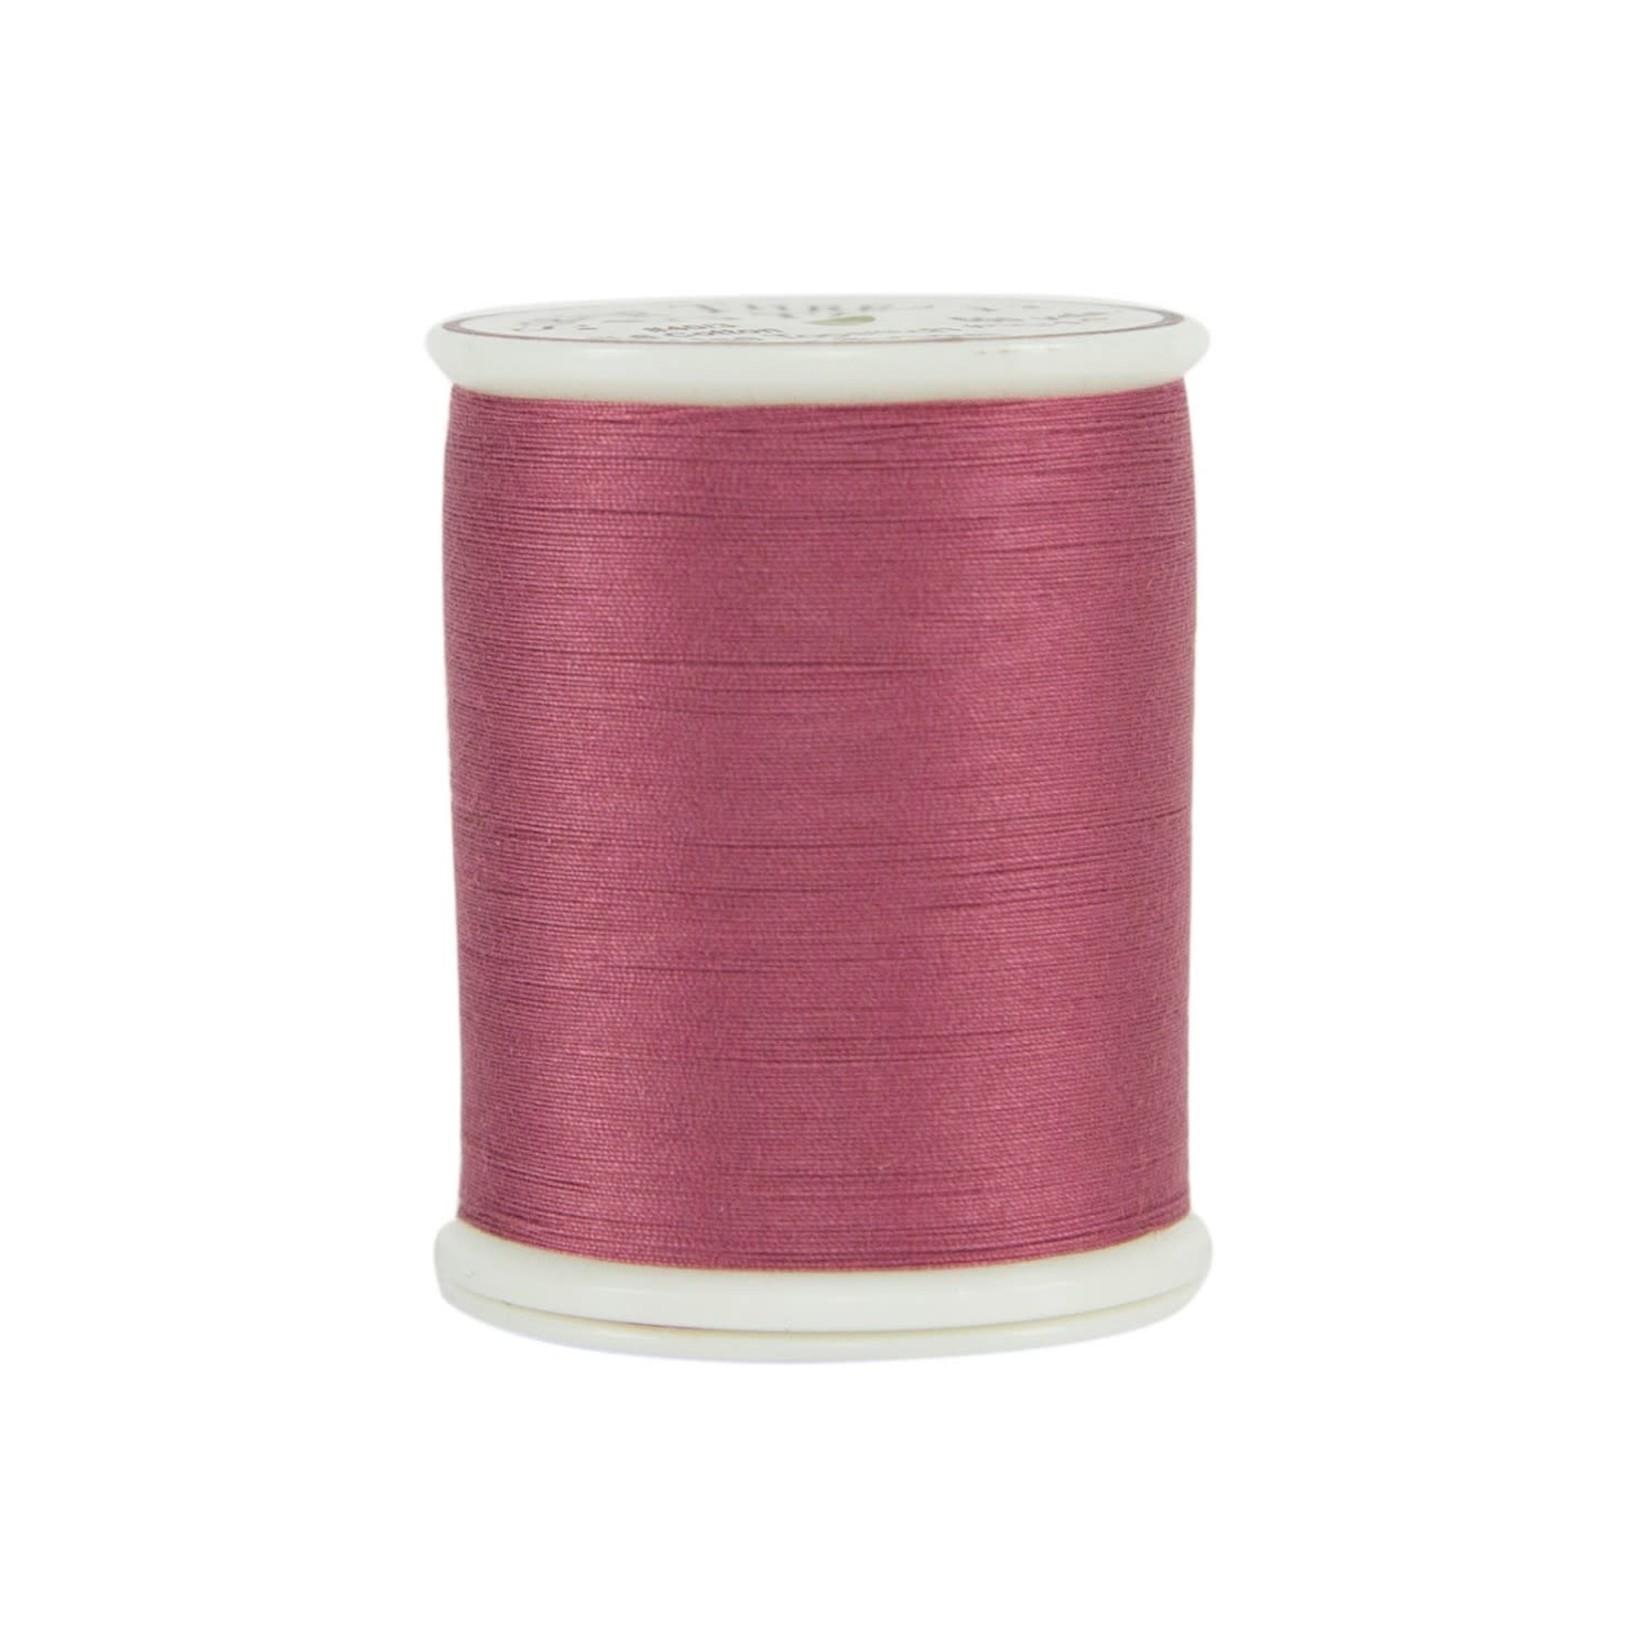 Superior Threads King Tut - #40 - 457 m - 1020 Raspberry Ripple